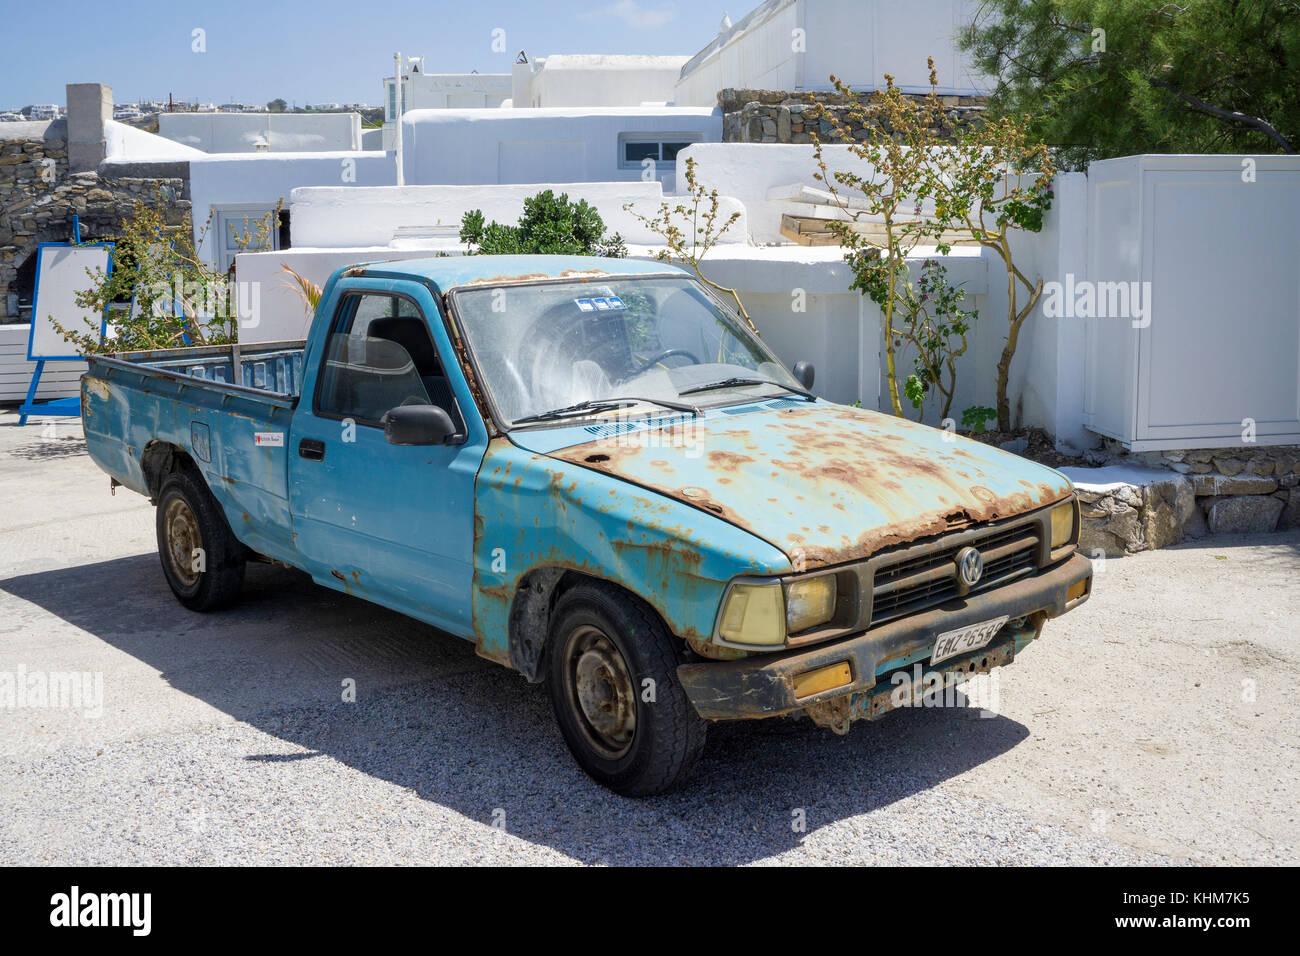 Old rusty Pick-up at Mykonos-town, Mykonos island, Cyclades, Aegean, Greece - Stock Image